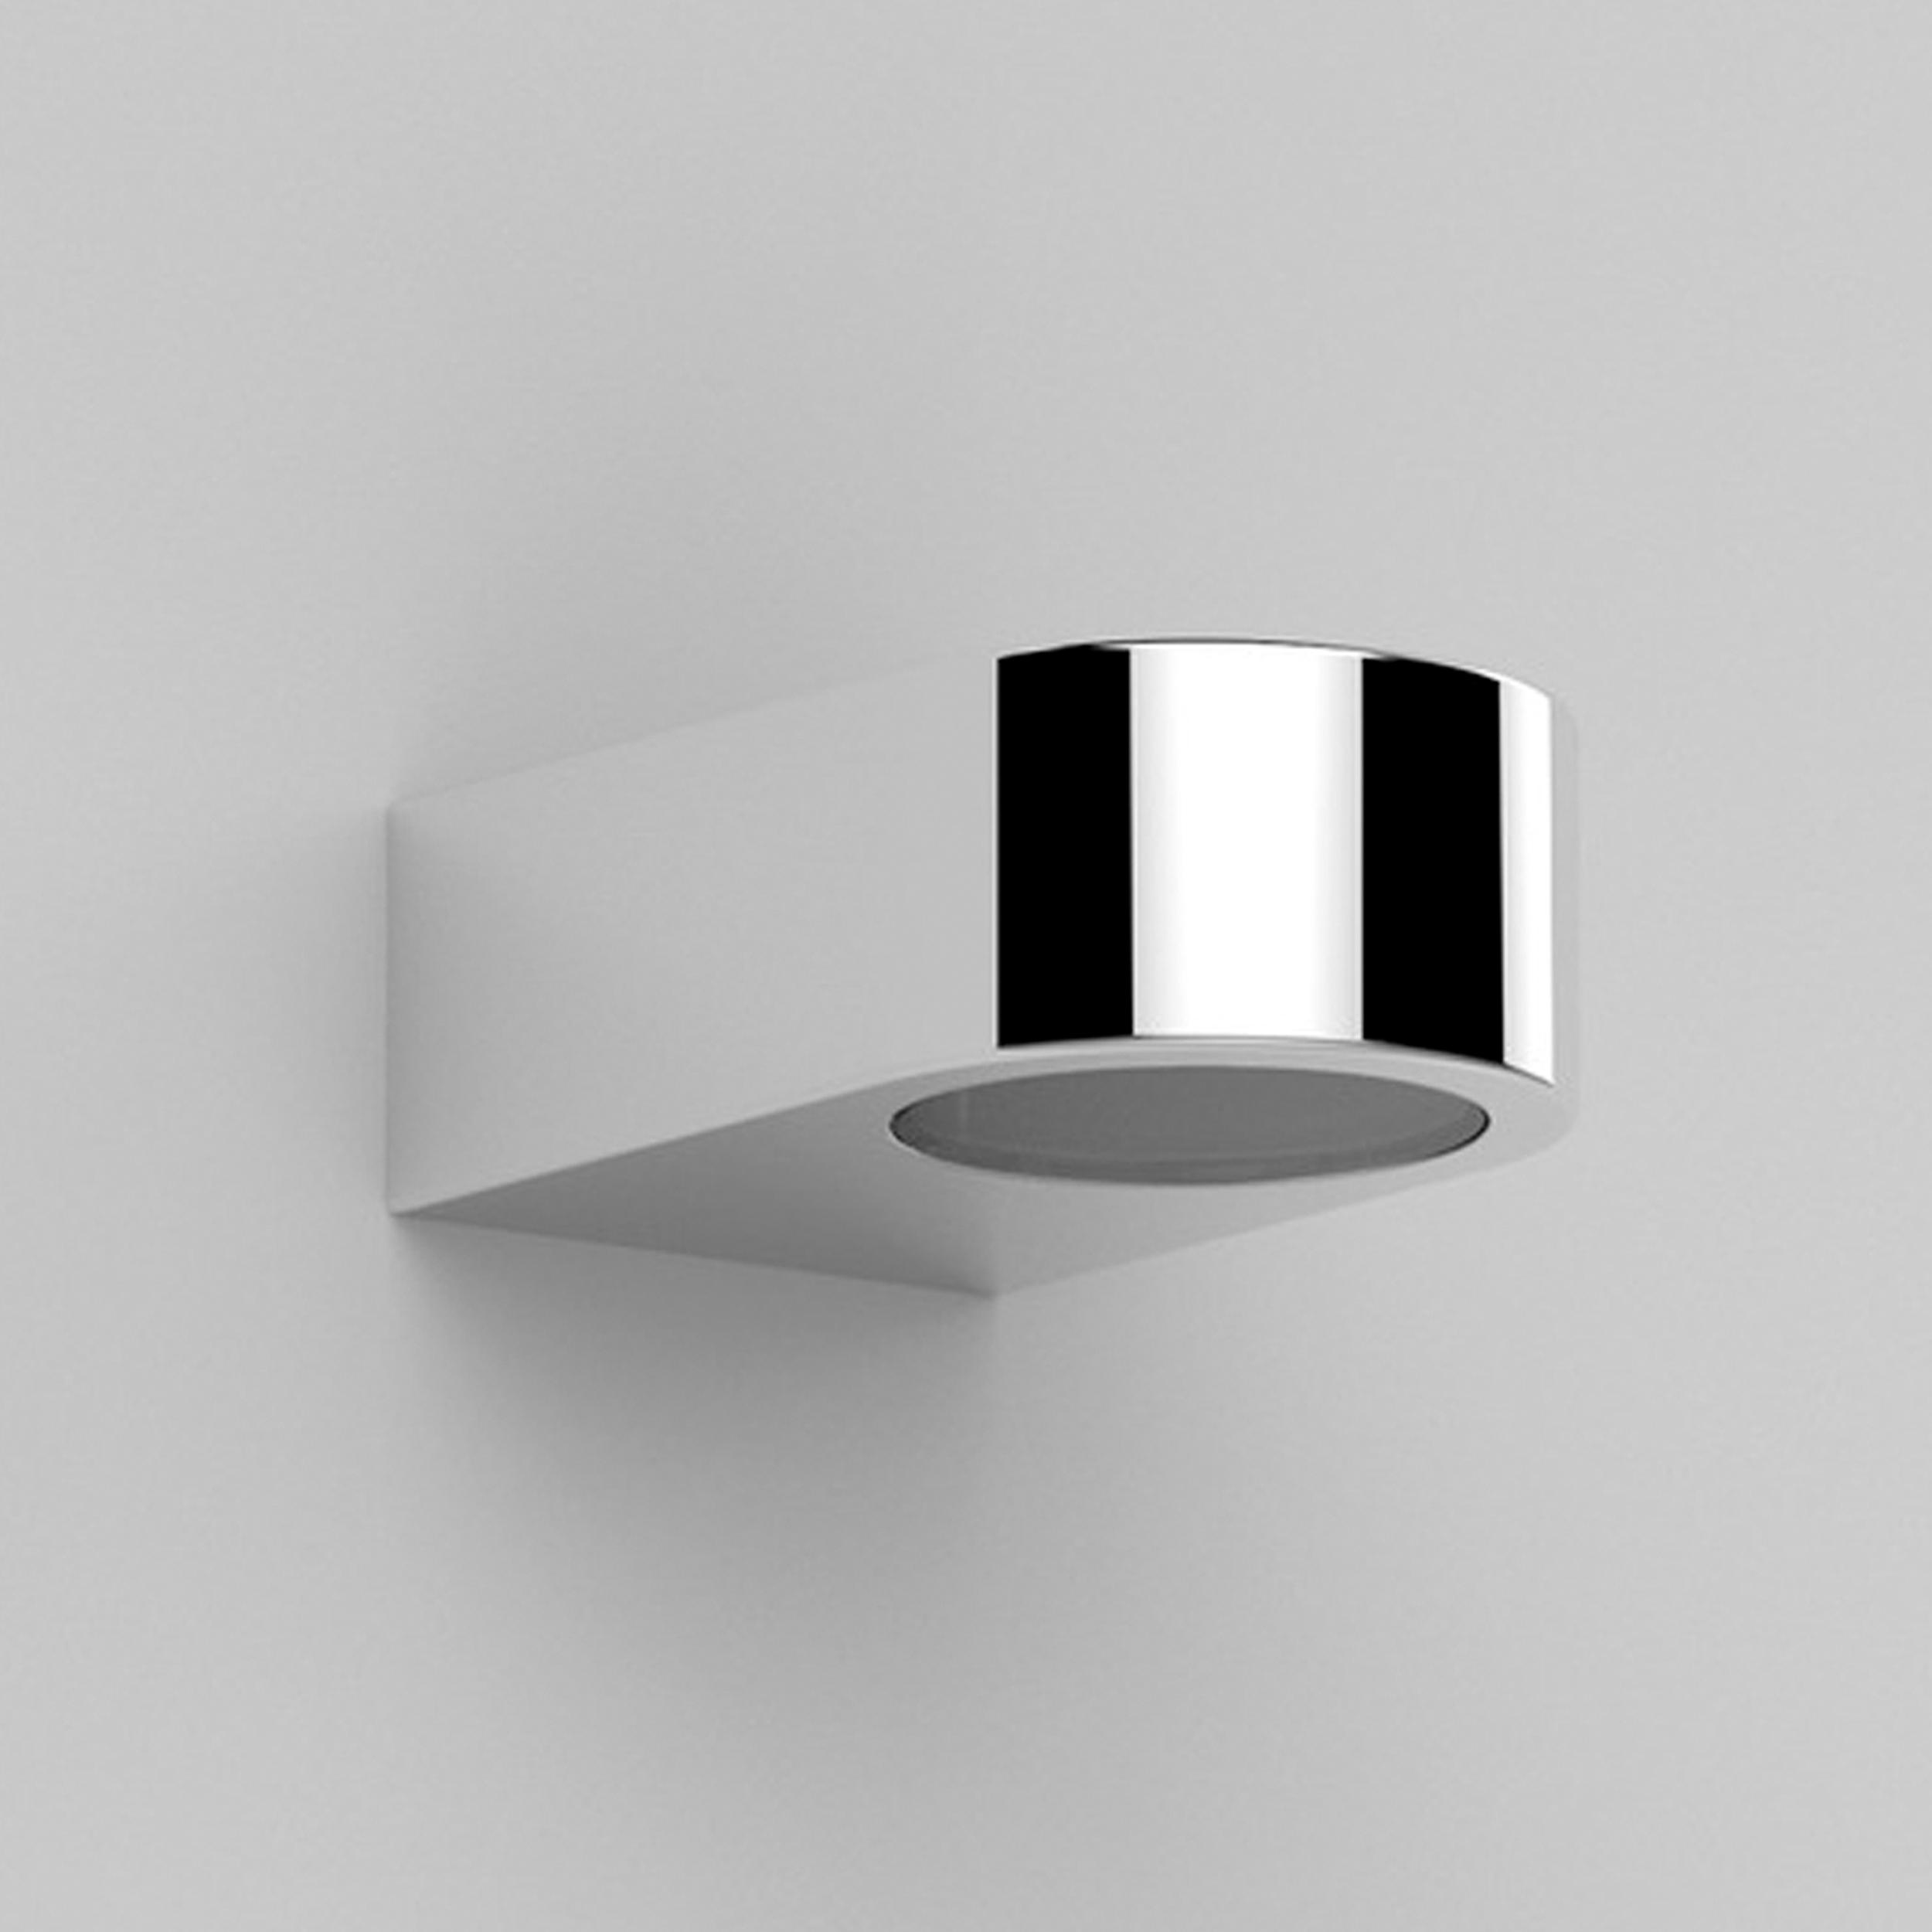 Astro Epsilon Led Wall Light Polished Chrome C